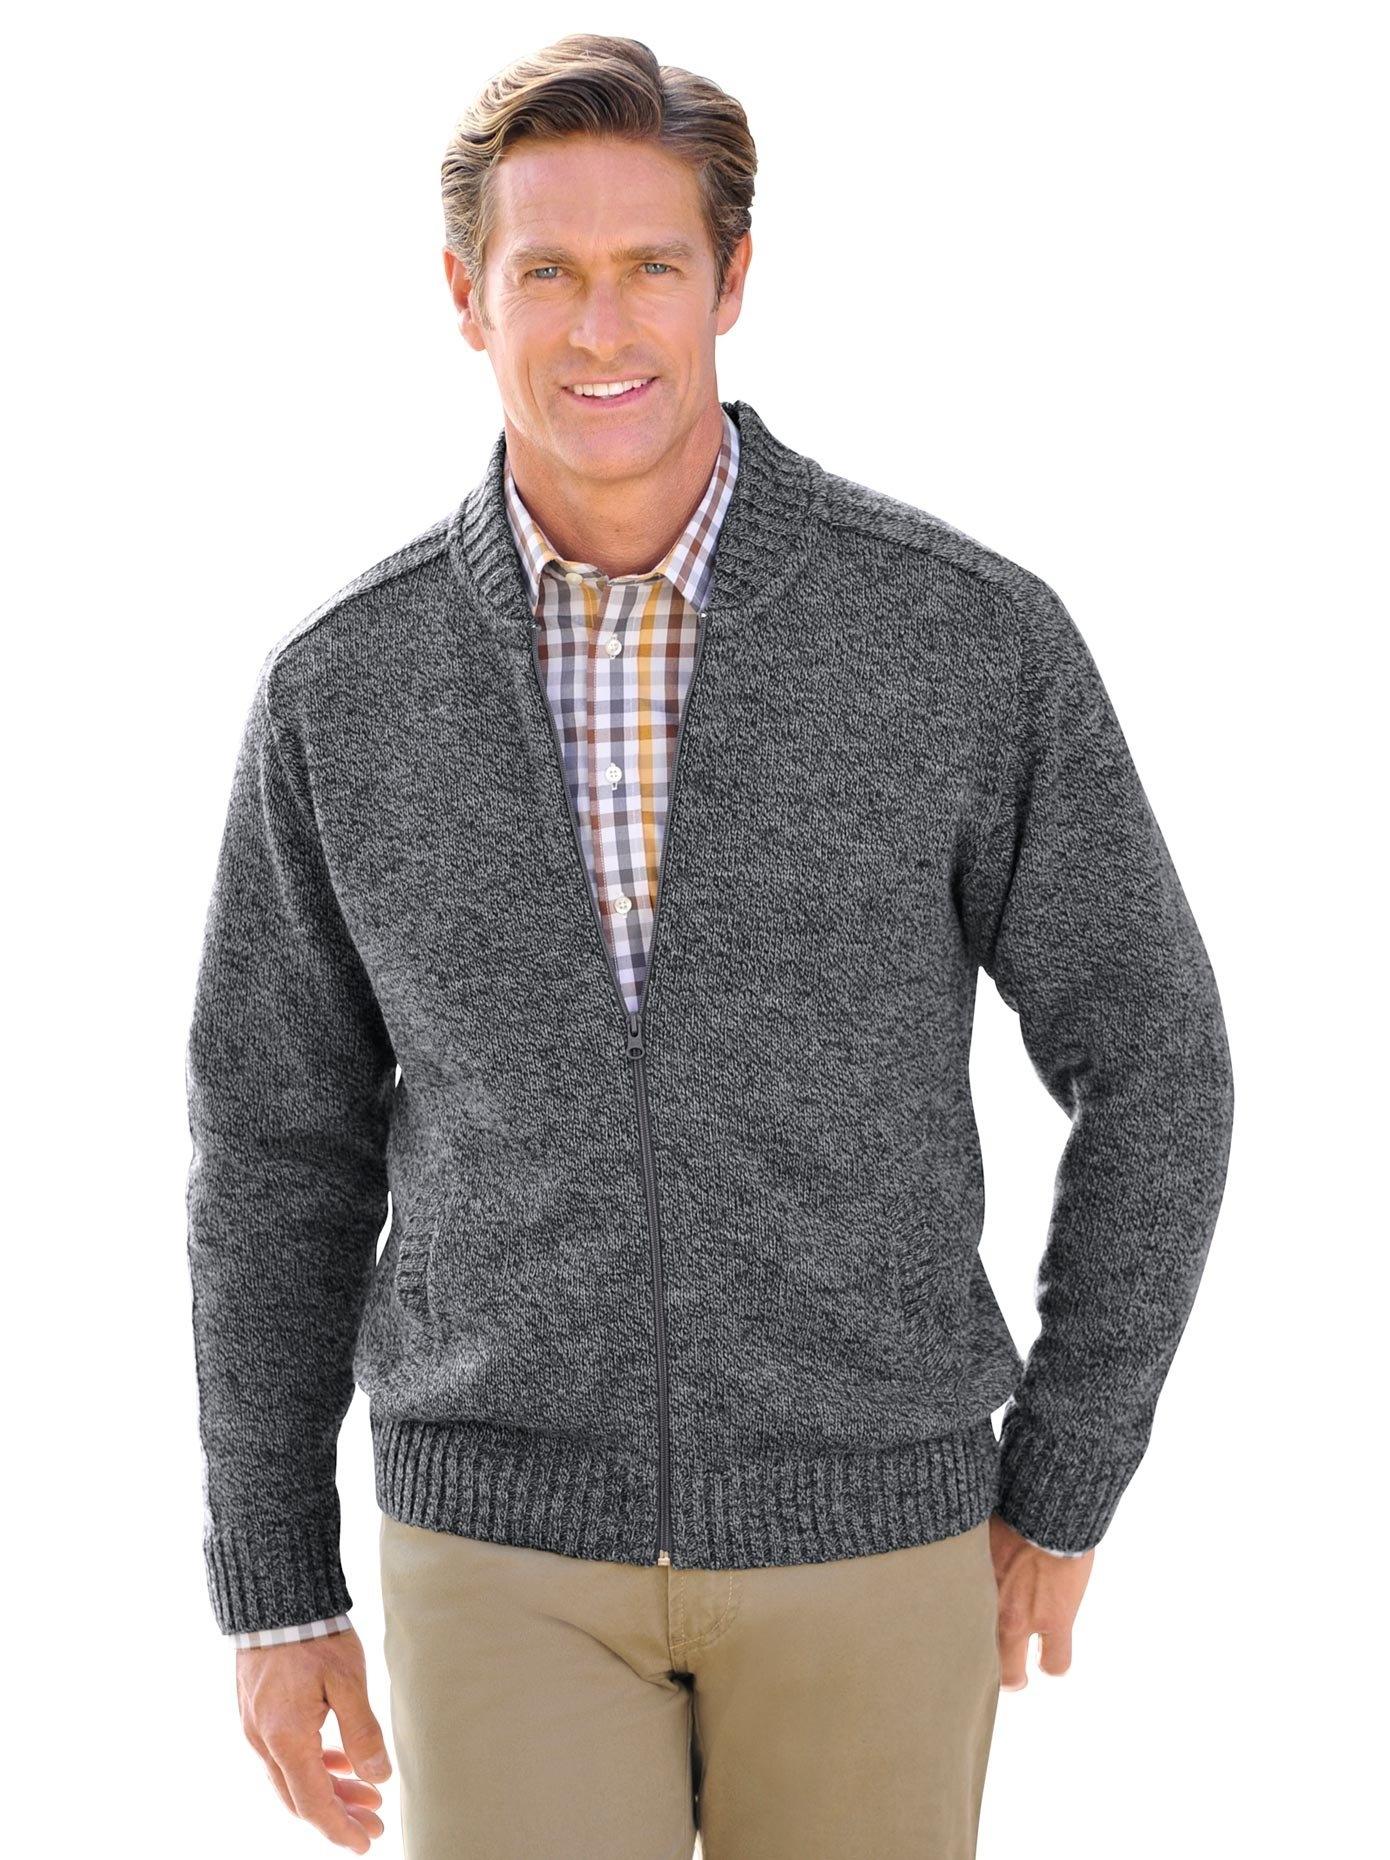 Classic J.WITT COLLECTION vest in mêleekwaliteit nu online bestellen